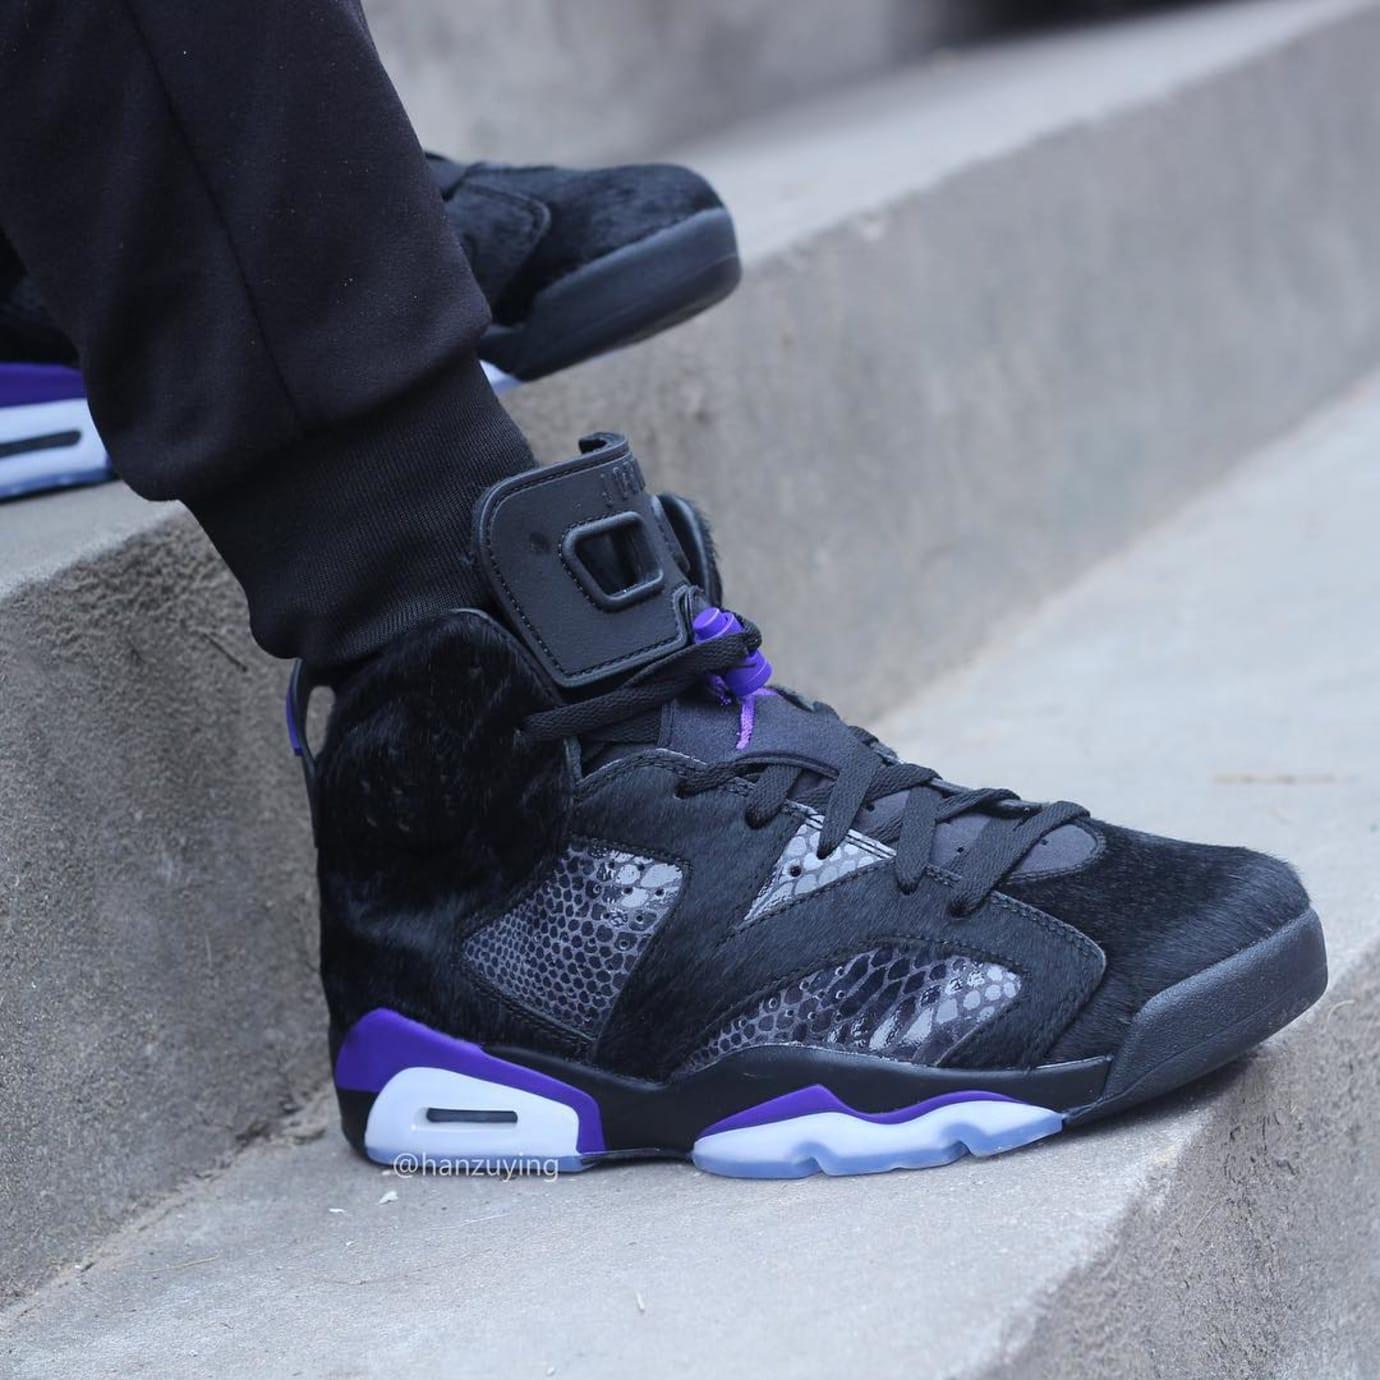 size 40 38f38 c7cd4 Image via hanzuying · Air Jordan 6 VI Cow Fur Snakeskin Black Purple  Release Date AR2257-005 On-